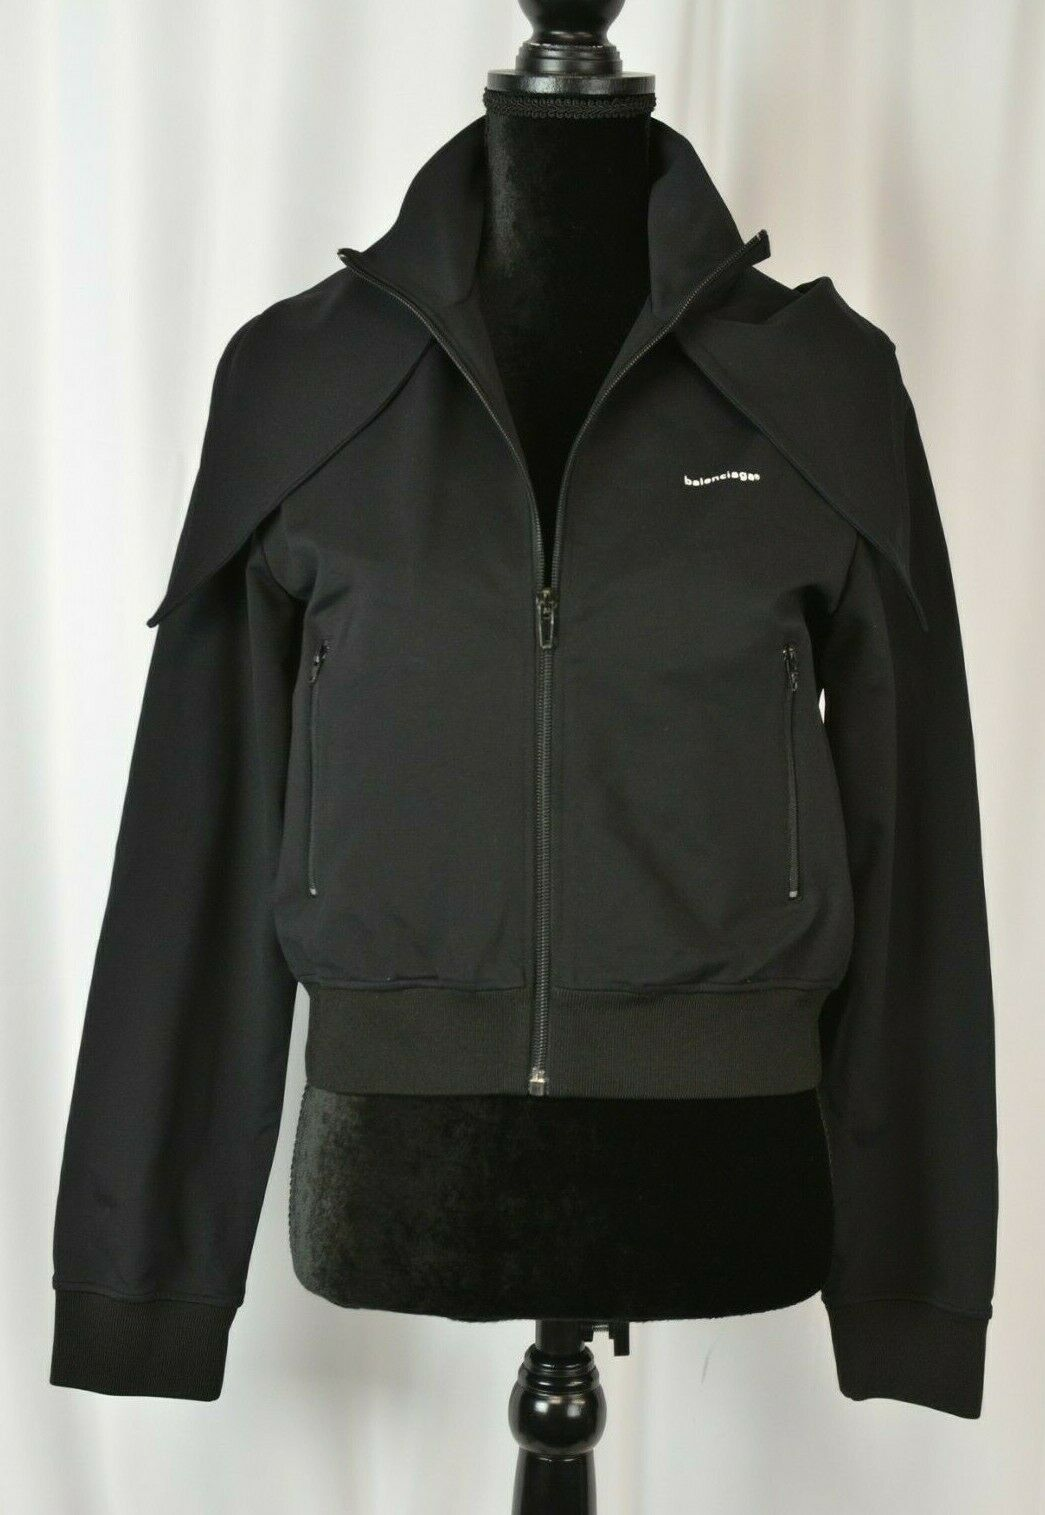 Balenciaga Women's Full Zip Hooded Jacket Size 44 Black Logo 8 US Cropped Boho